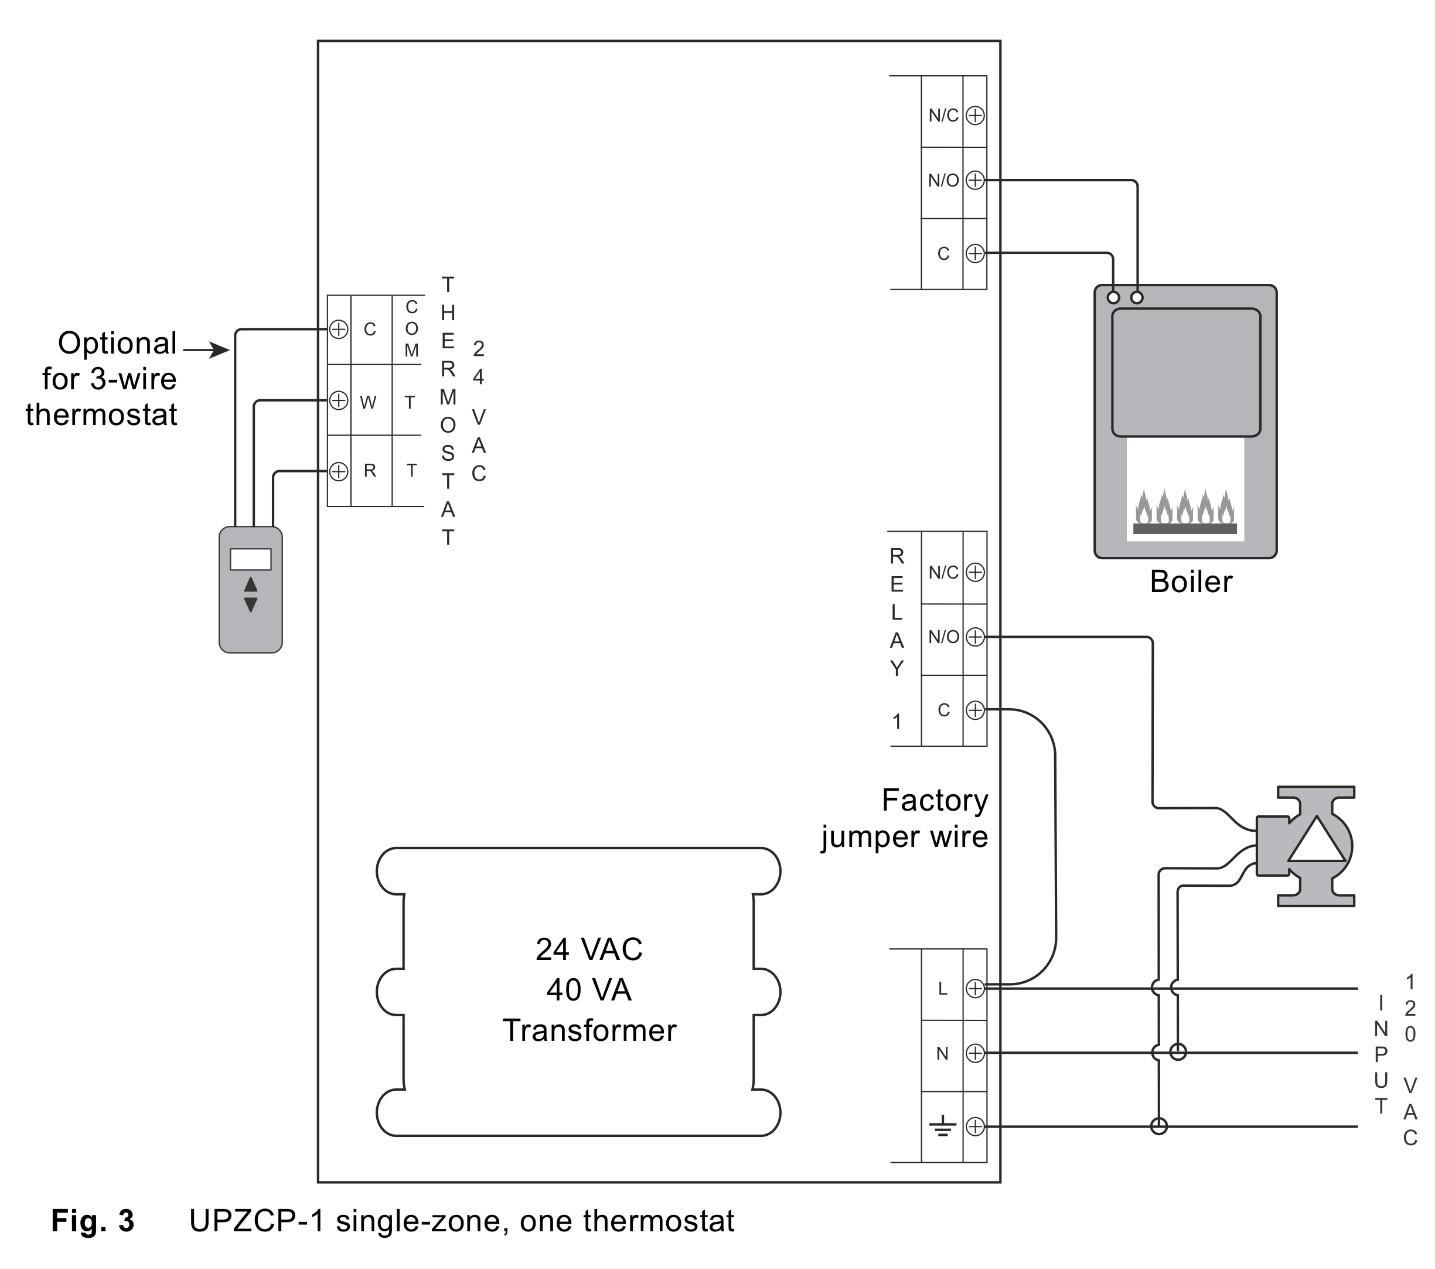 taco 006 b4 wiring diagram Download-taco 006 b4 wiring diagram Download Taco 007 F5 Wiring Diagram Gallery Taco Wiring Diagram DOWNLOAD Wiring Diagram Detail Name taco 006 b4 17-b